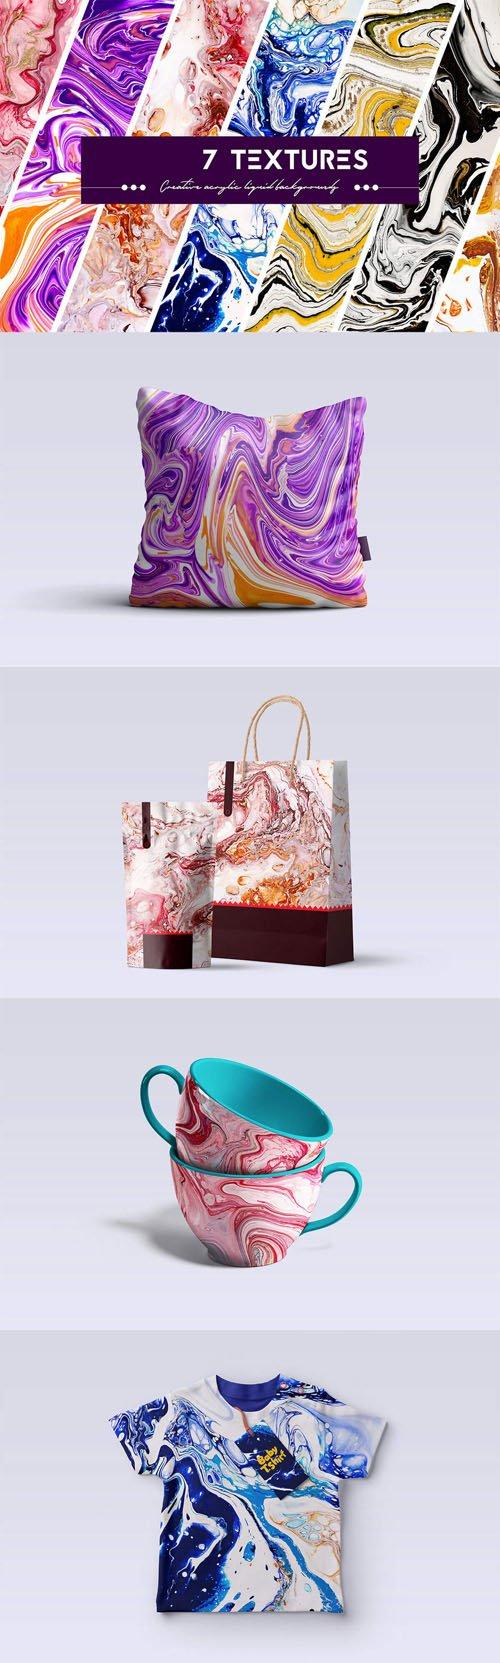 7 Acrylic Liquid Paints Textures